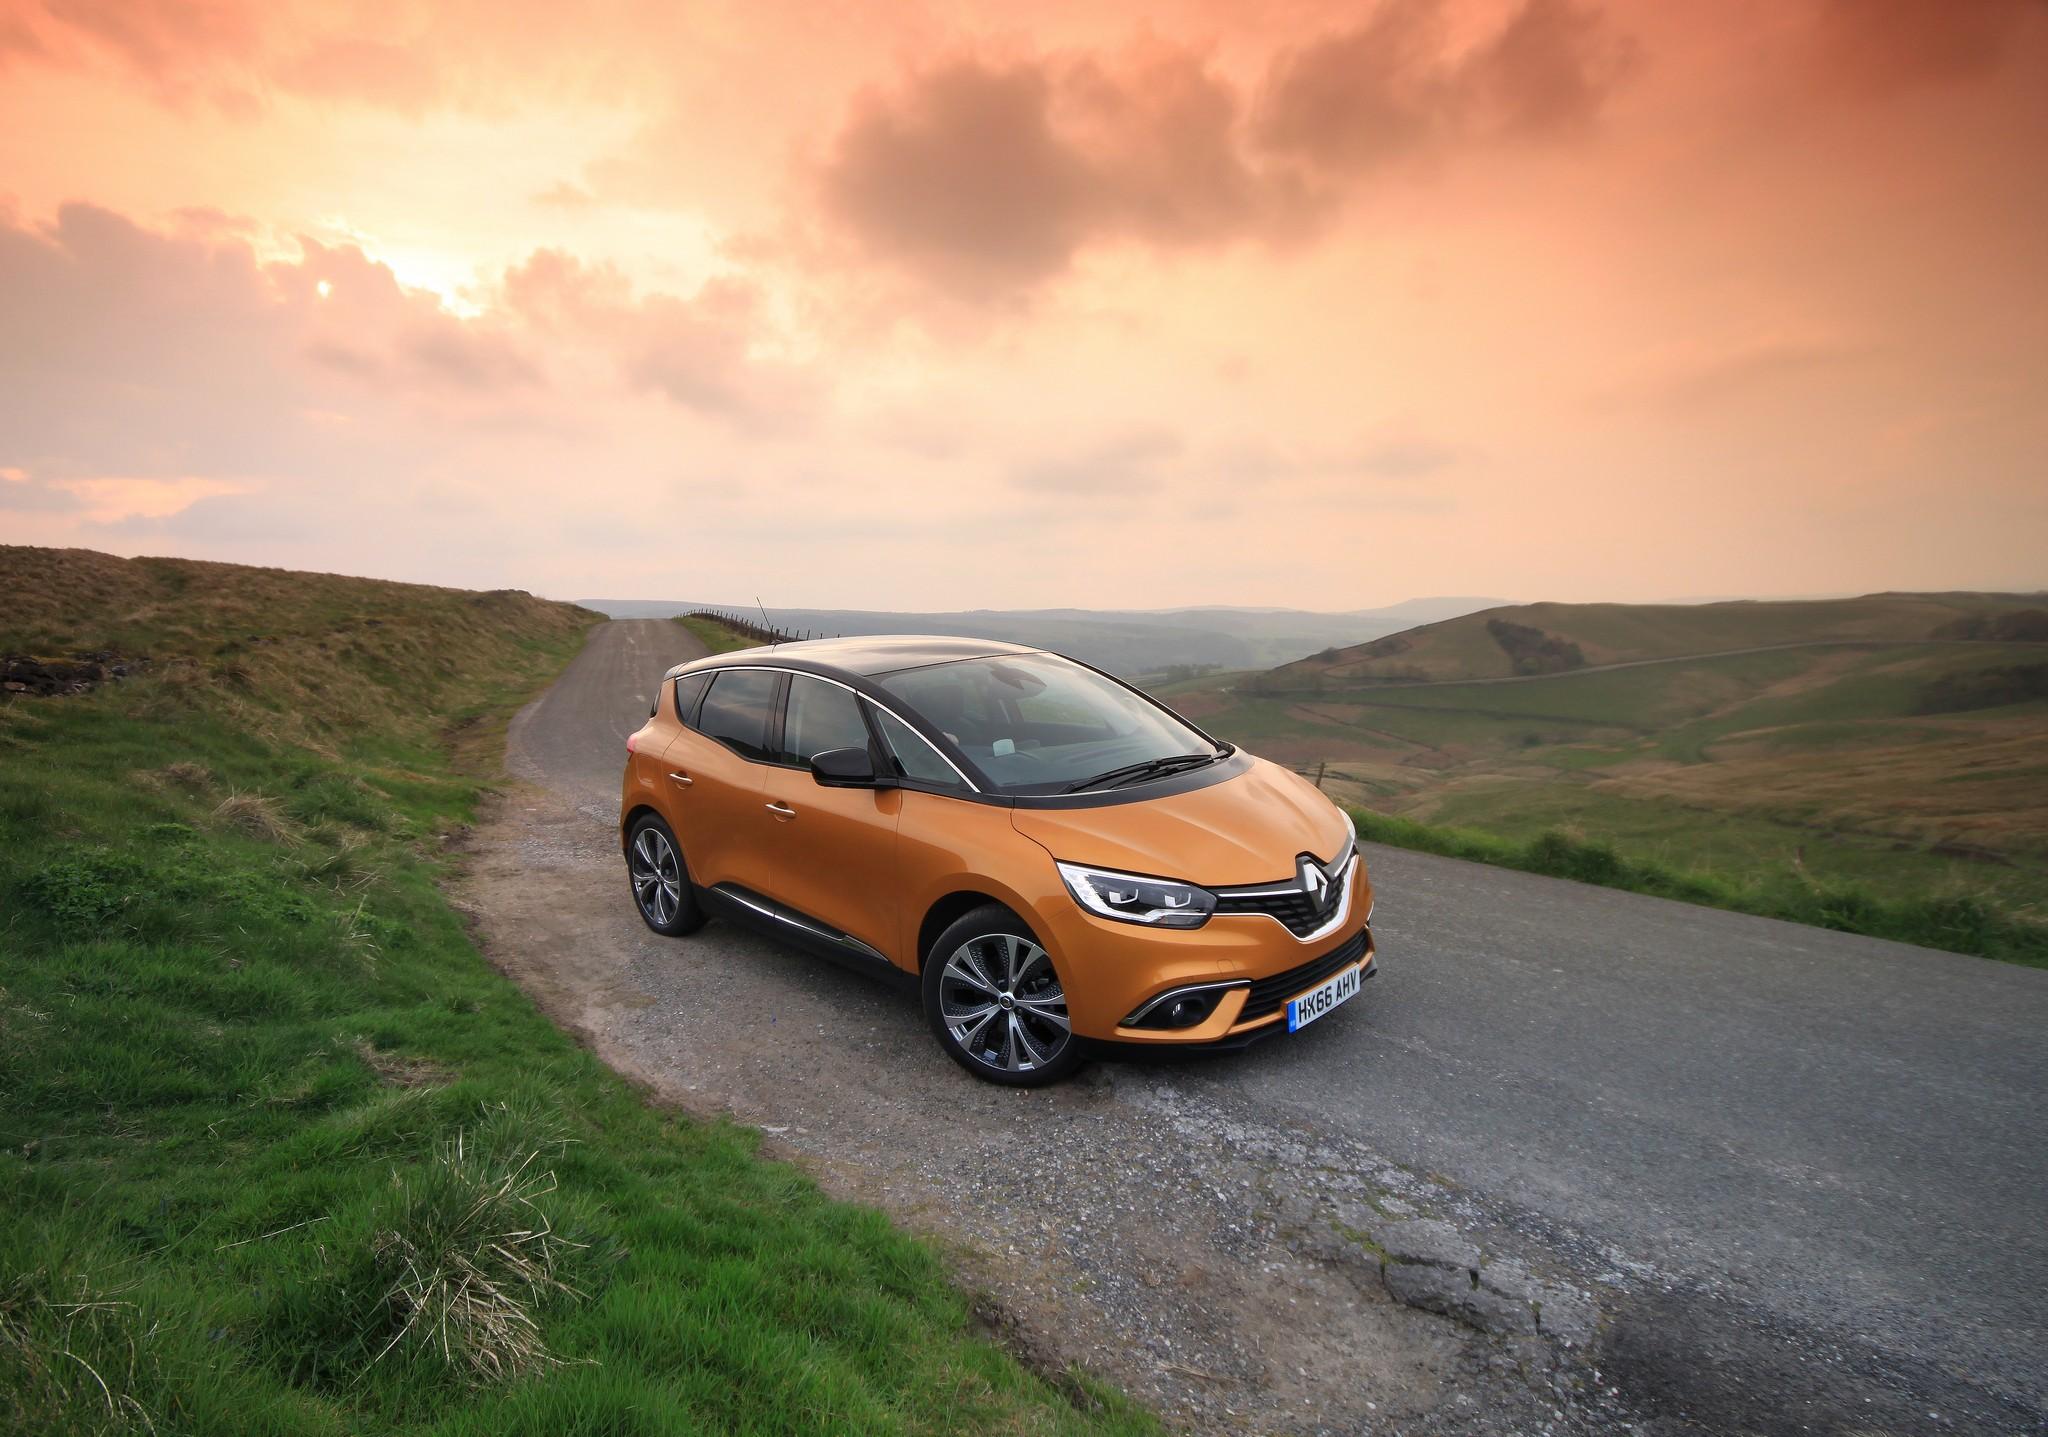 Renault Scenic Dynamique S Nav 1.5 dCi 110 - Review